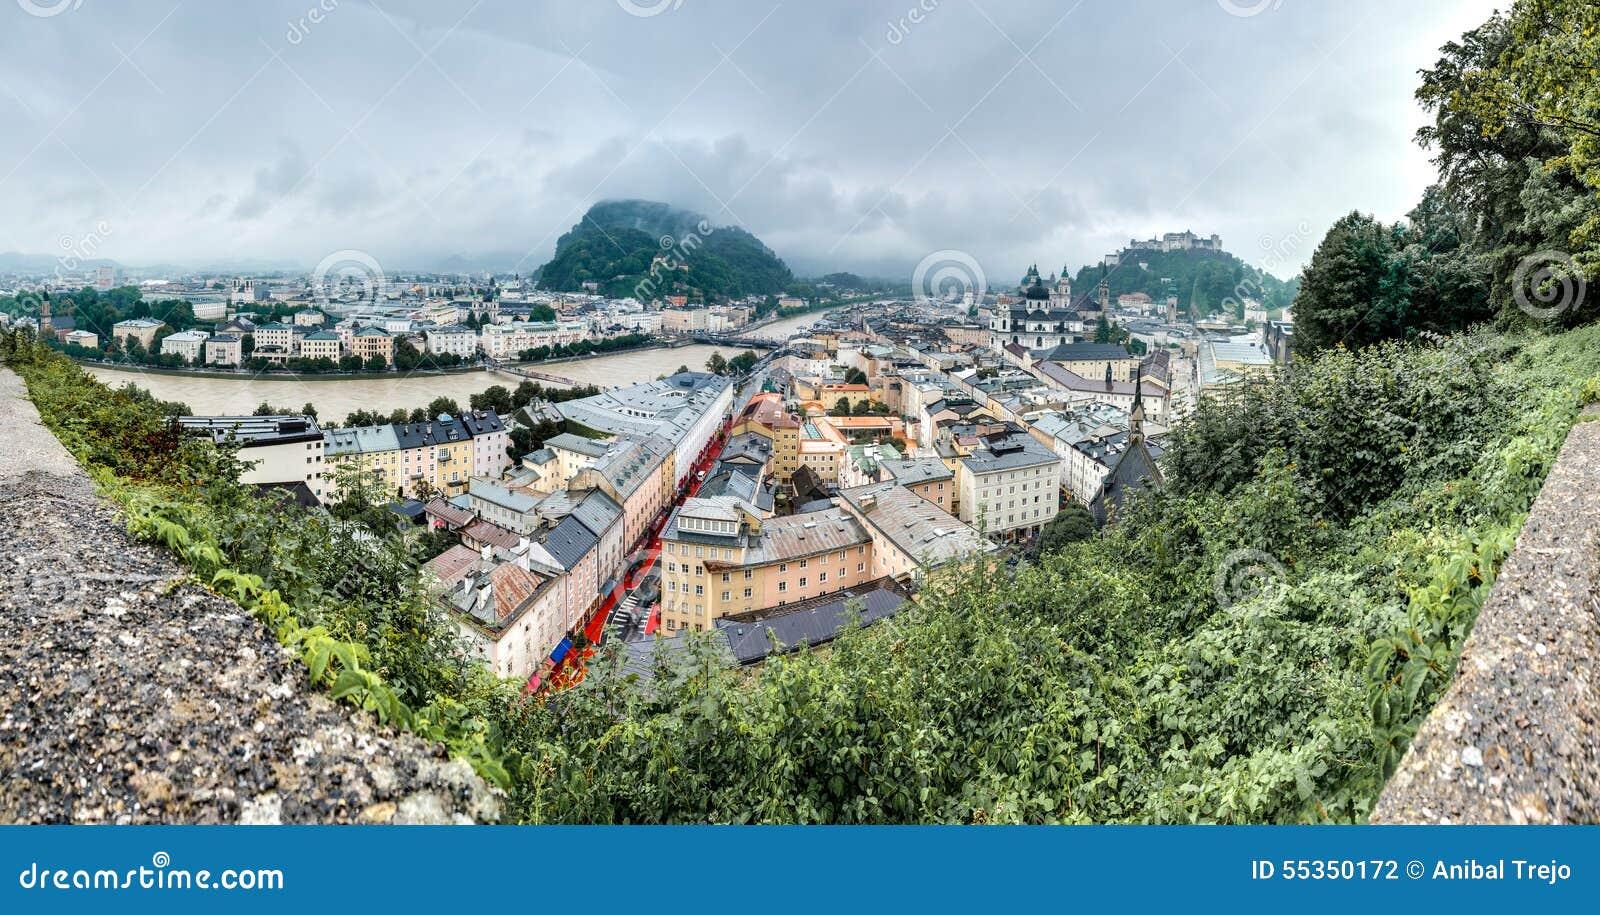 Salisburgo veduta da Monchsberg, Austria